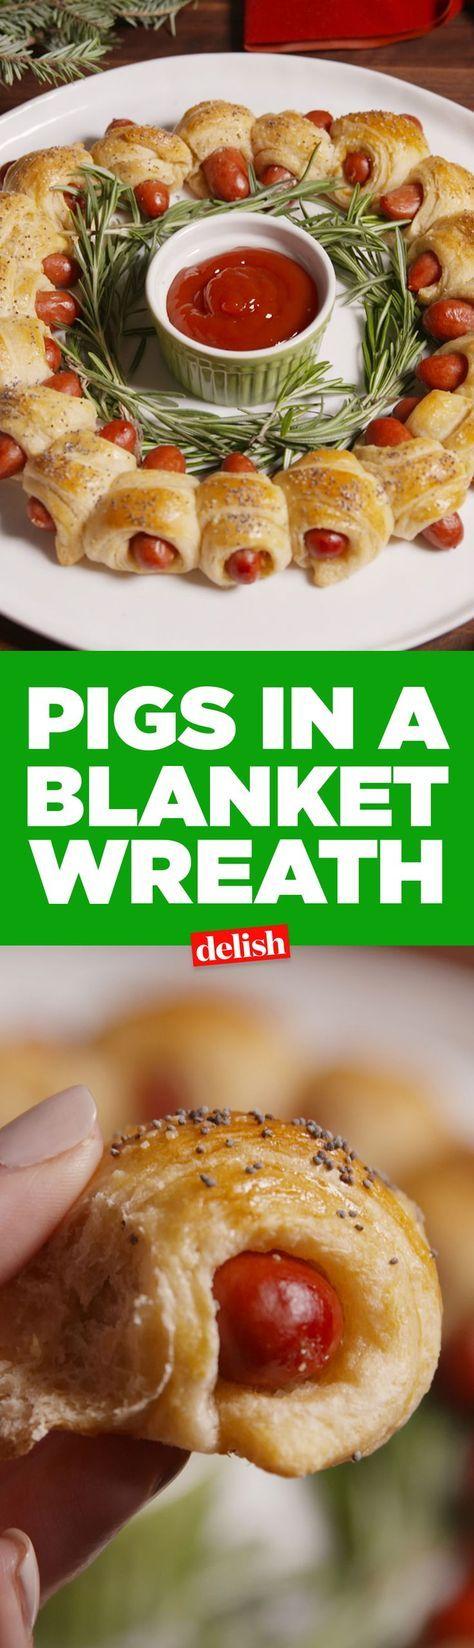 Christmas Eve Party Food Ideas Part - 24: Pinterest